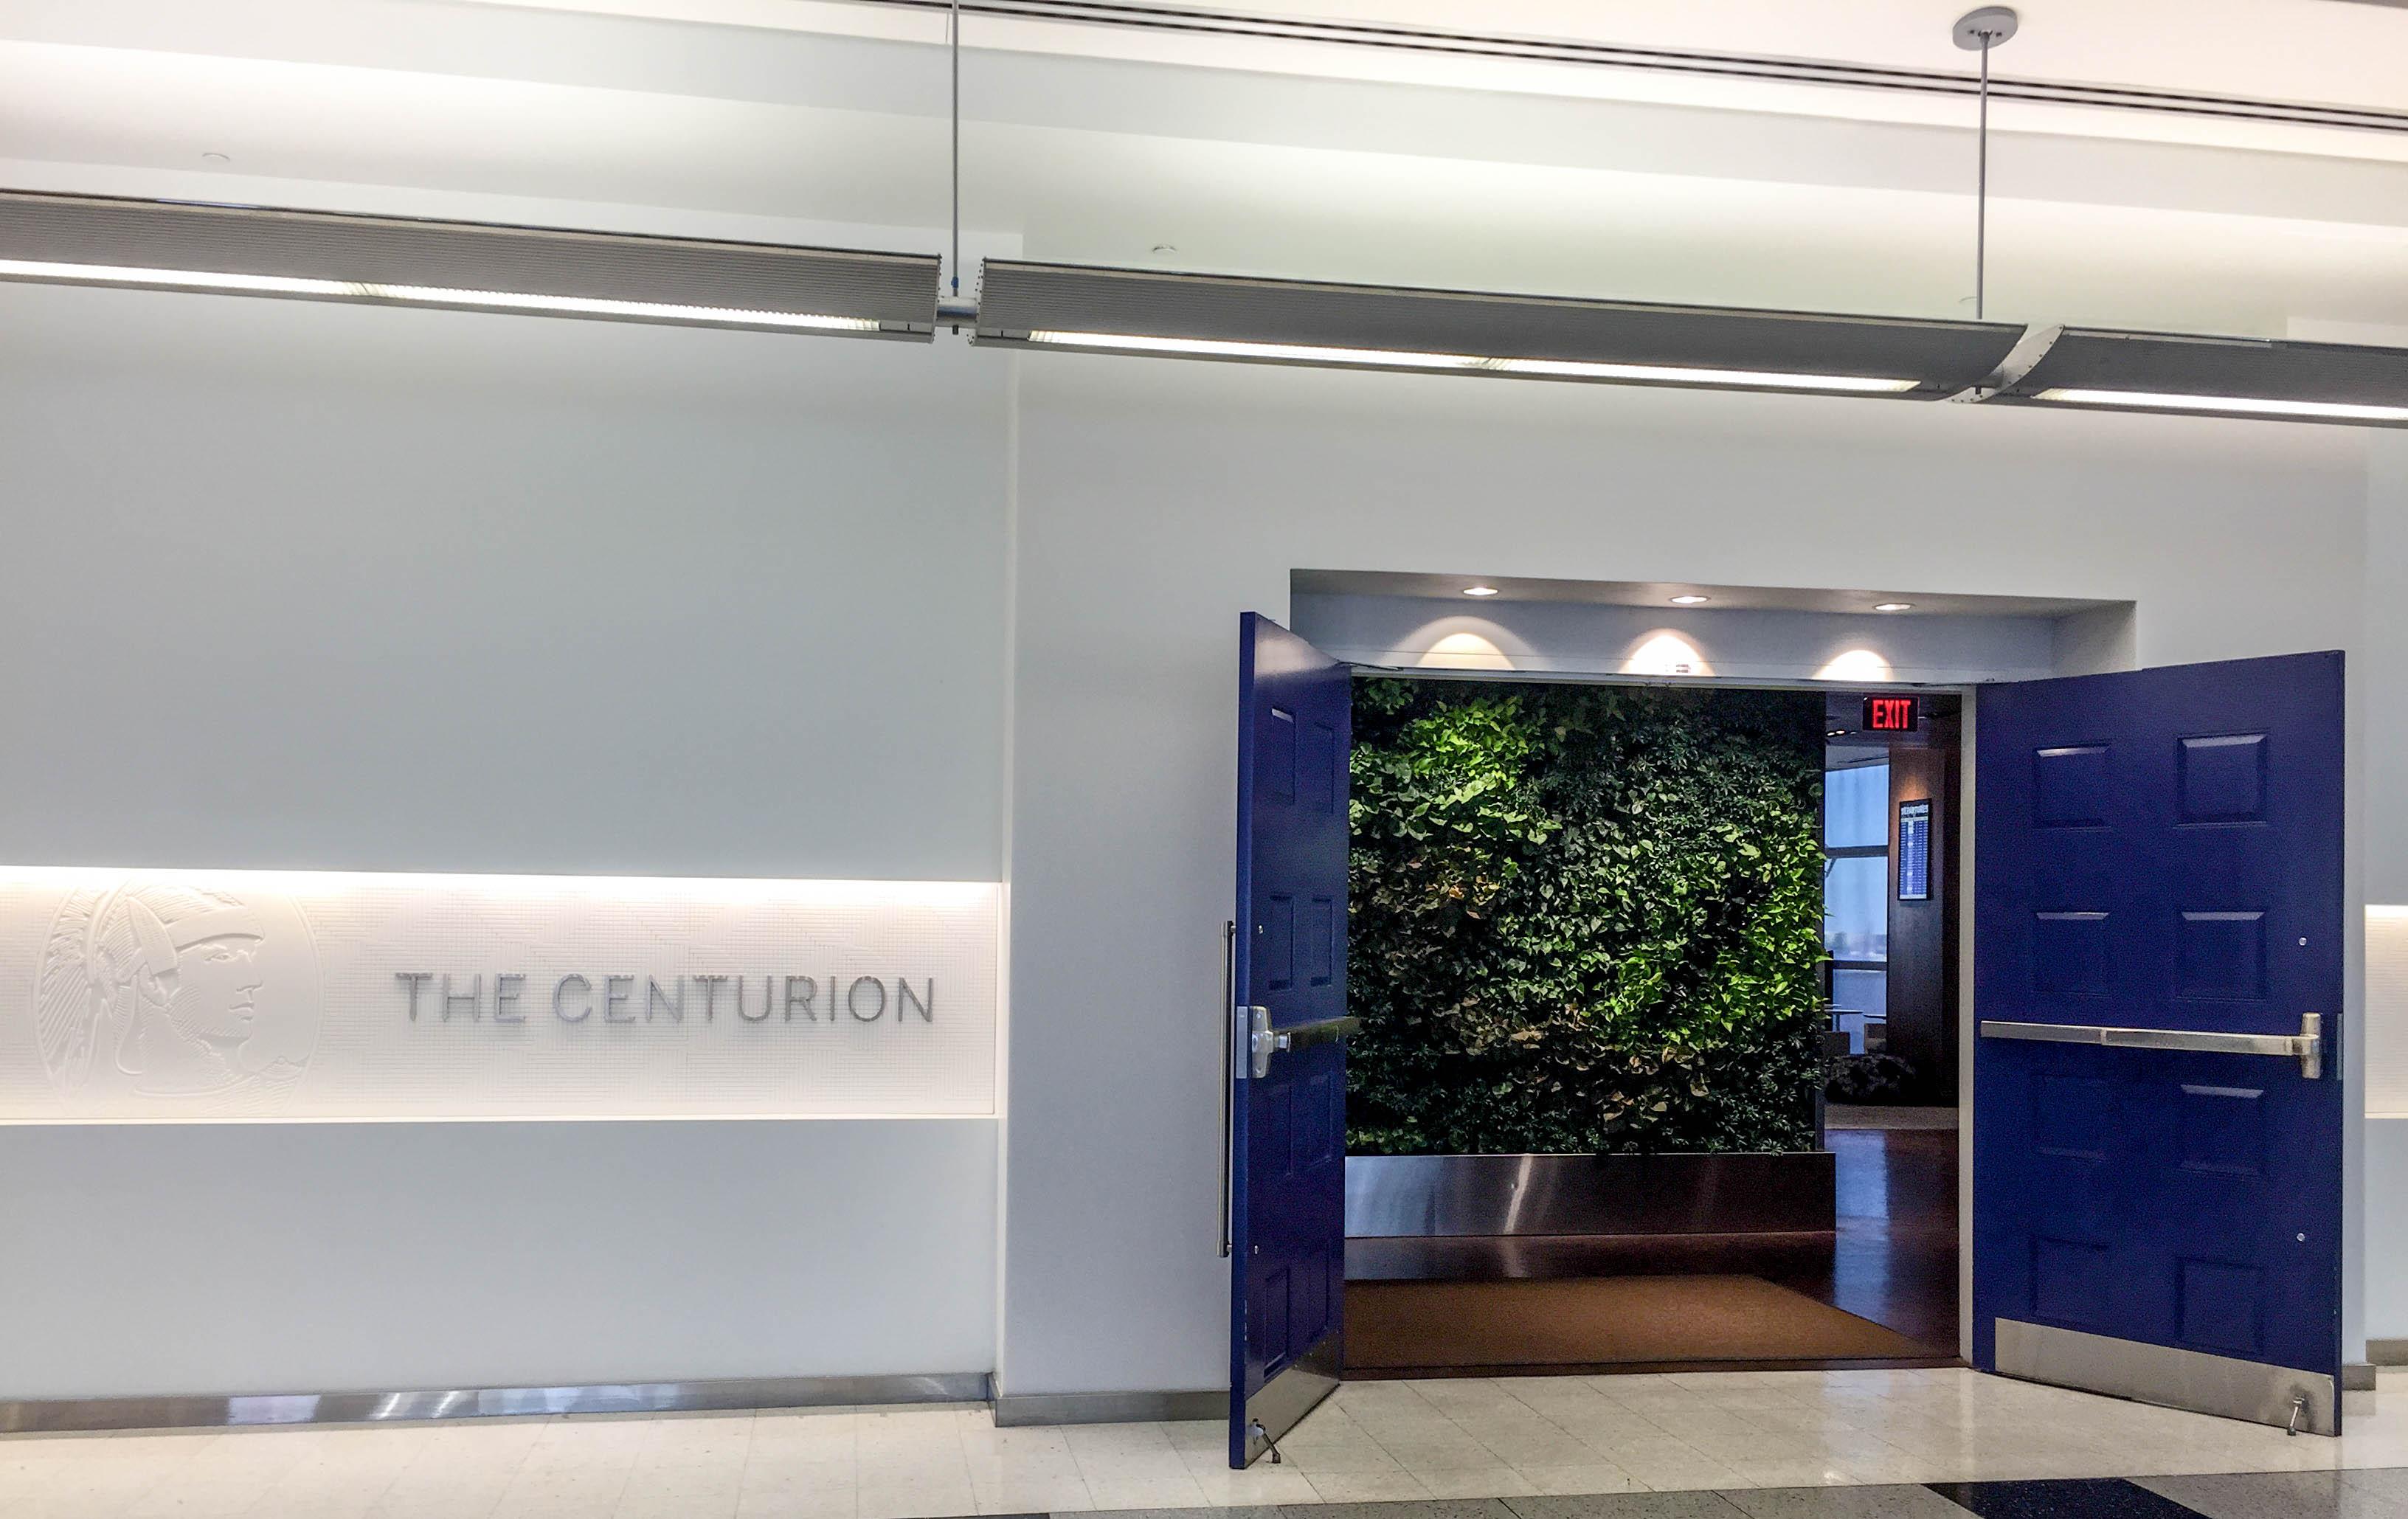 Centurion Lounge at LAS